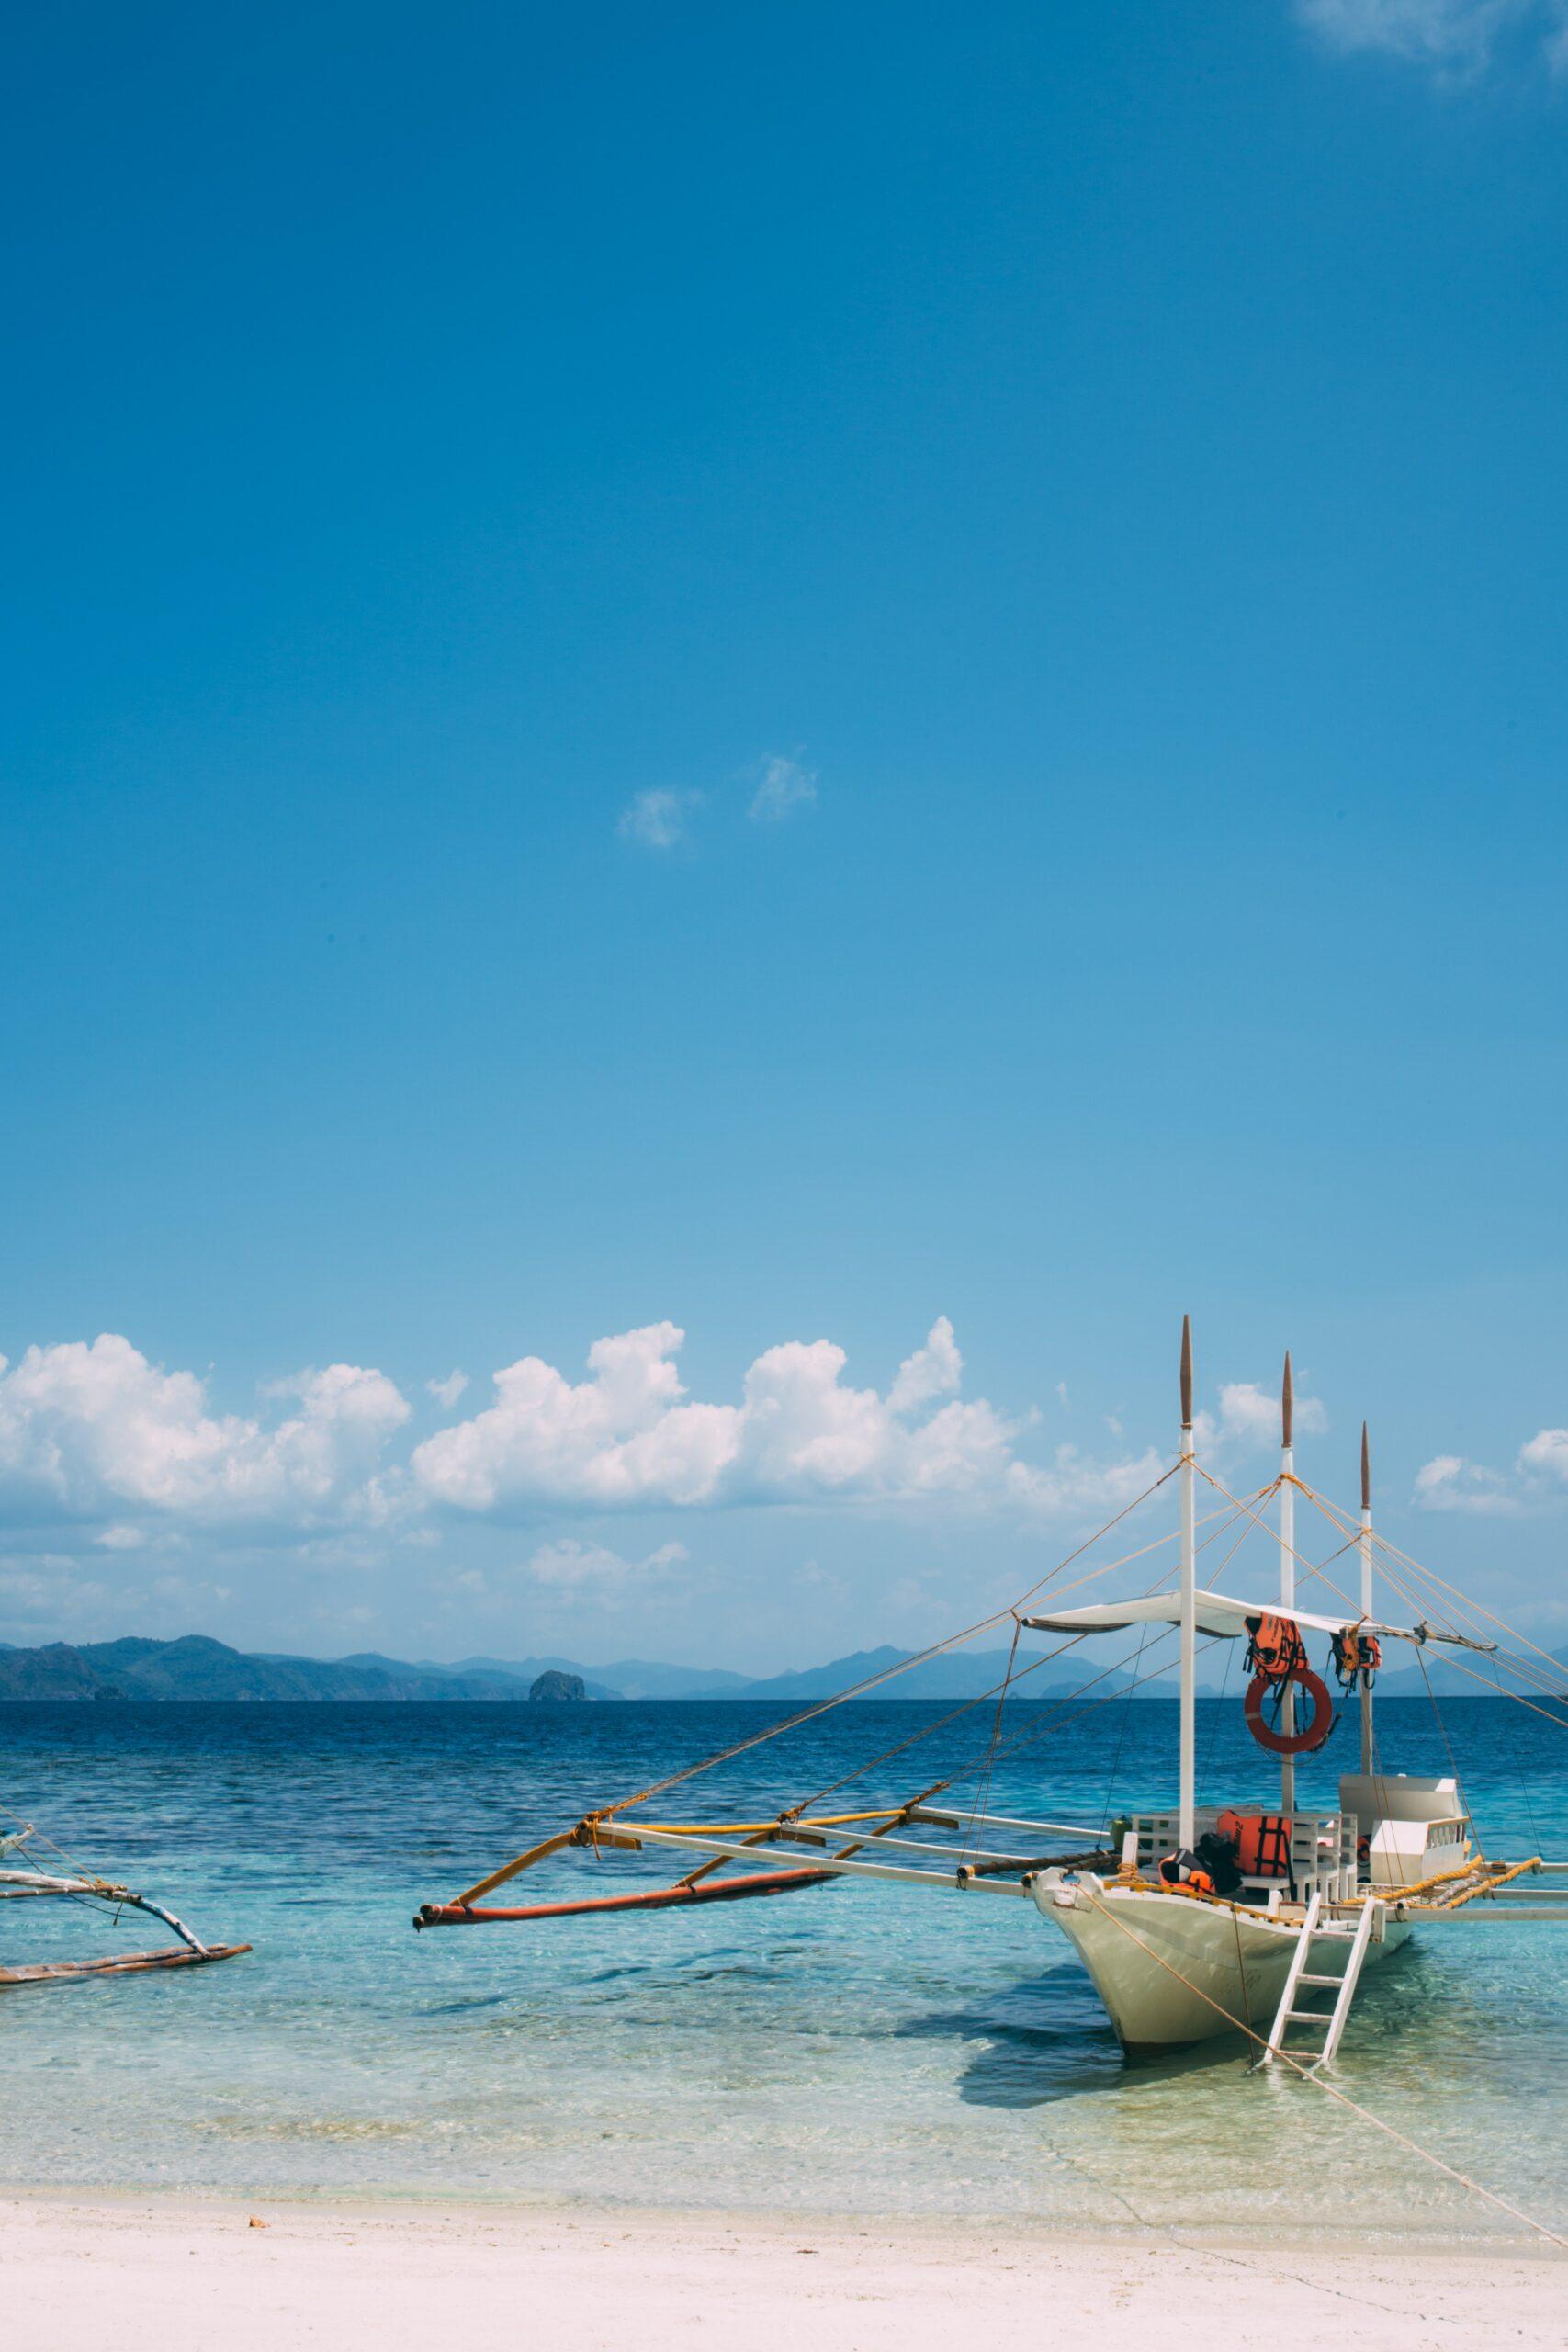 Philippines Borocay Overtourism